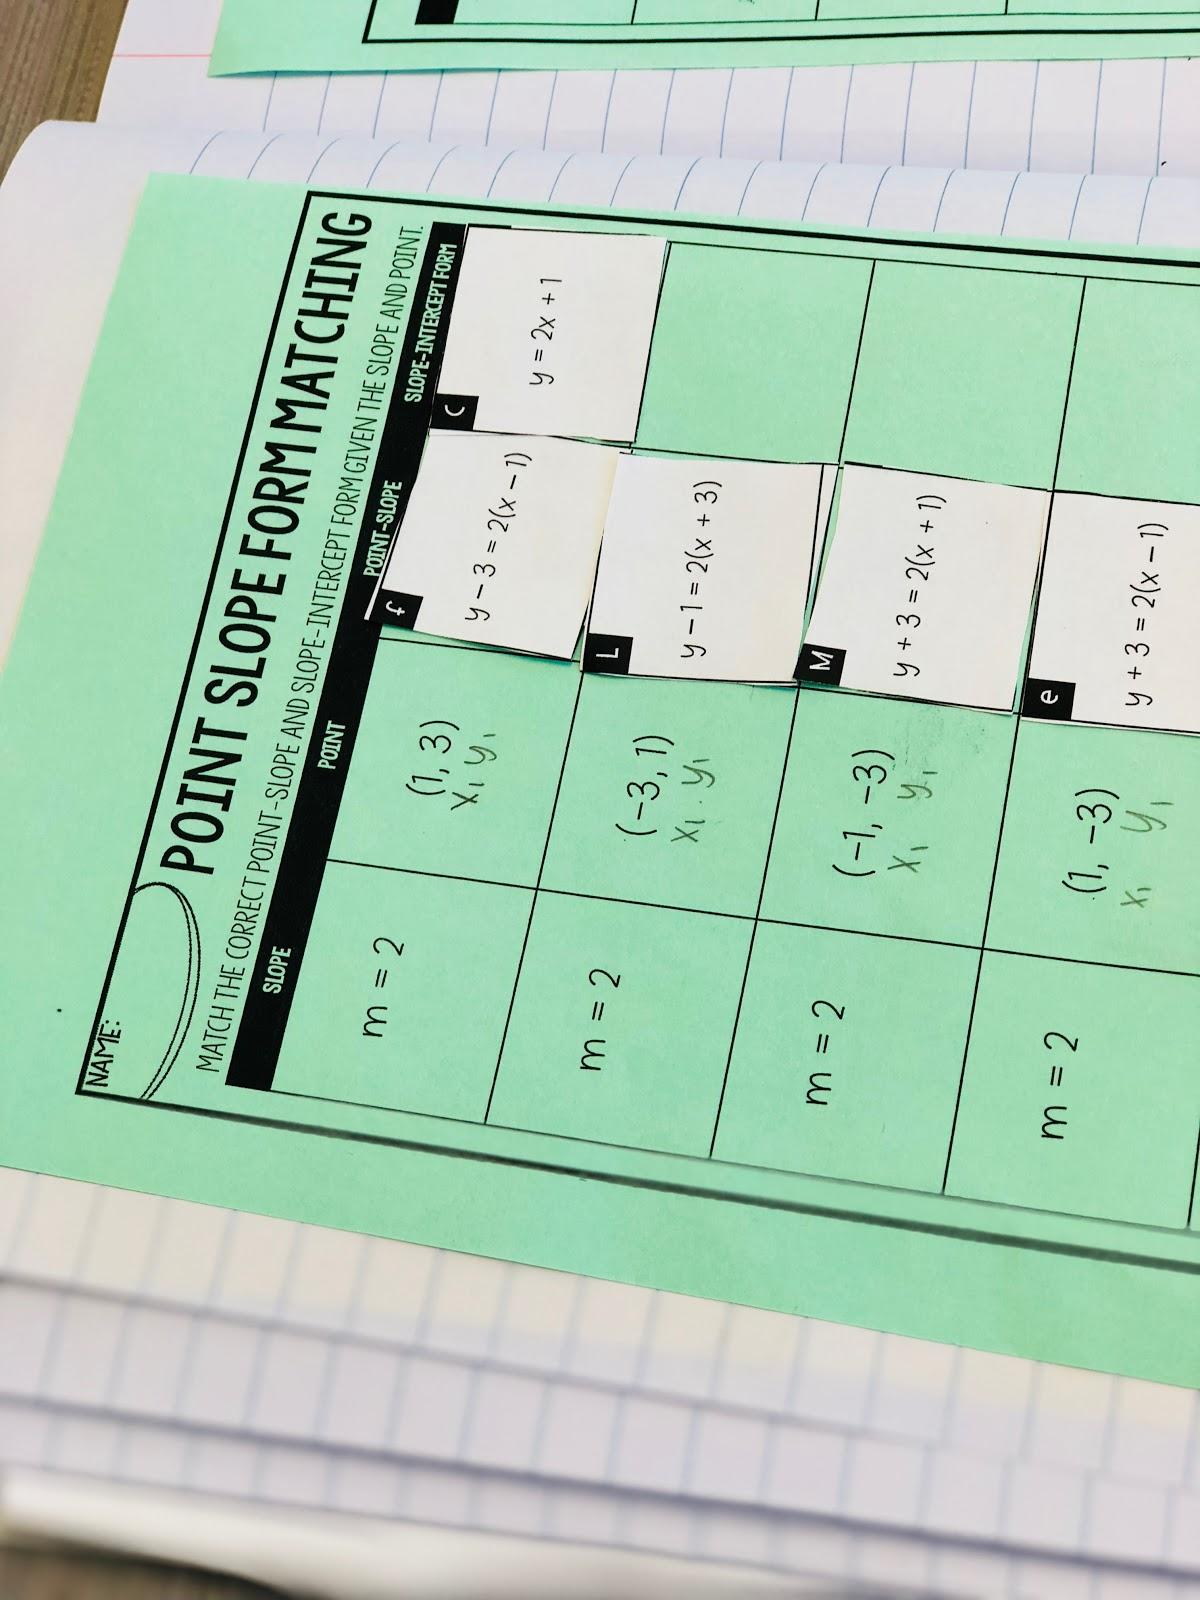 Point Slope Form Inb Mrs Newells Math